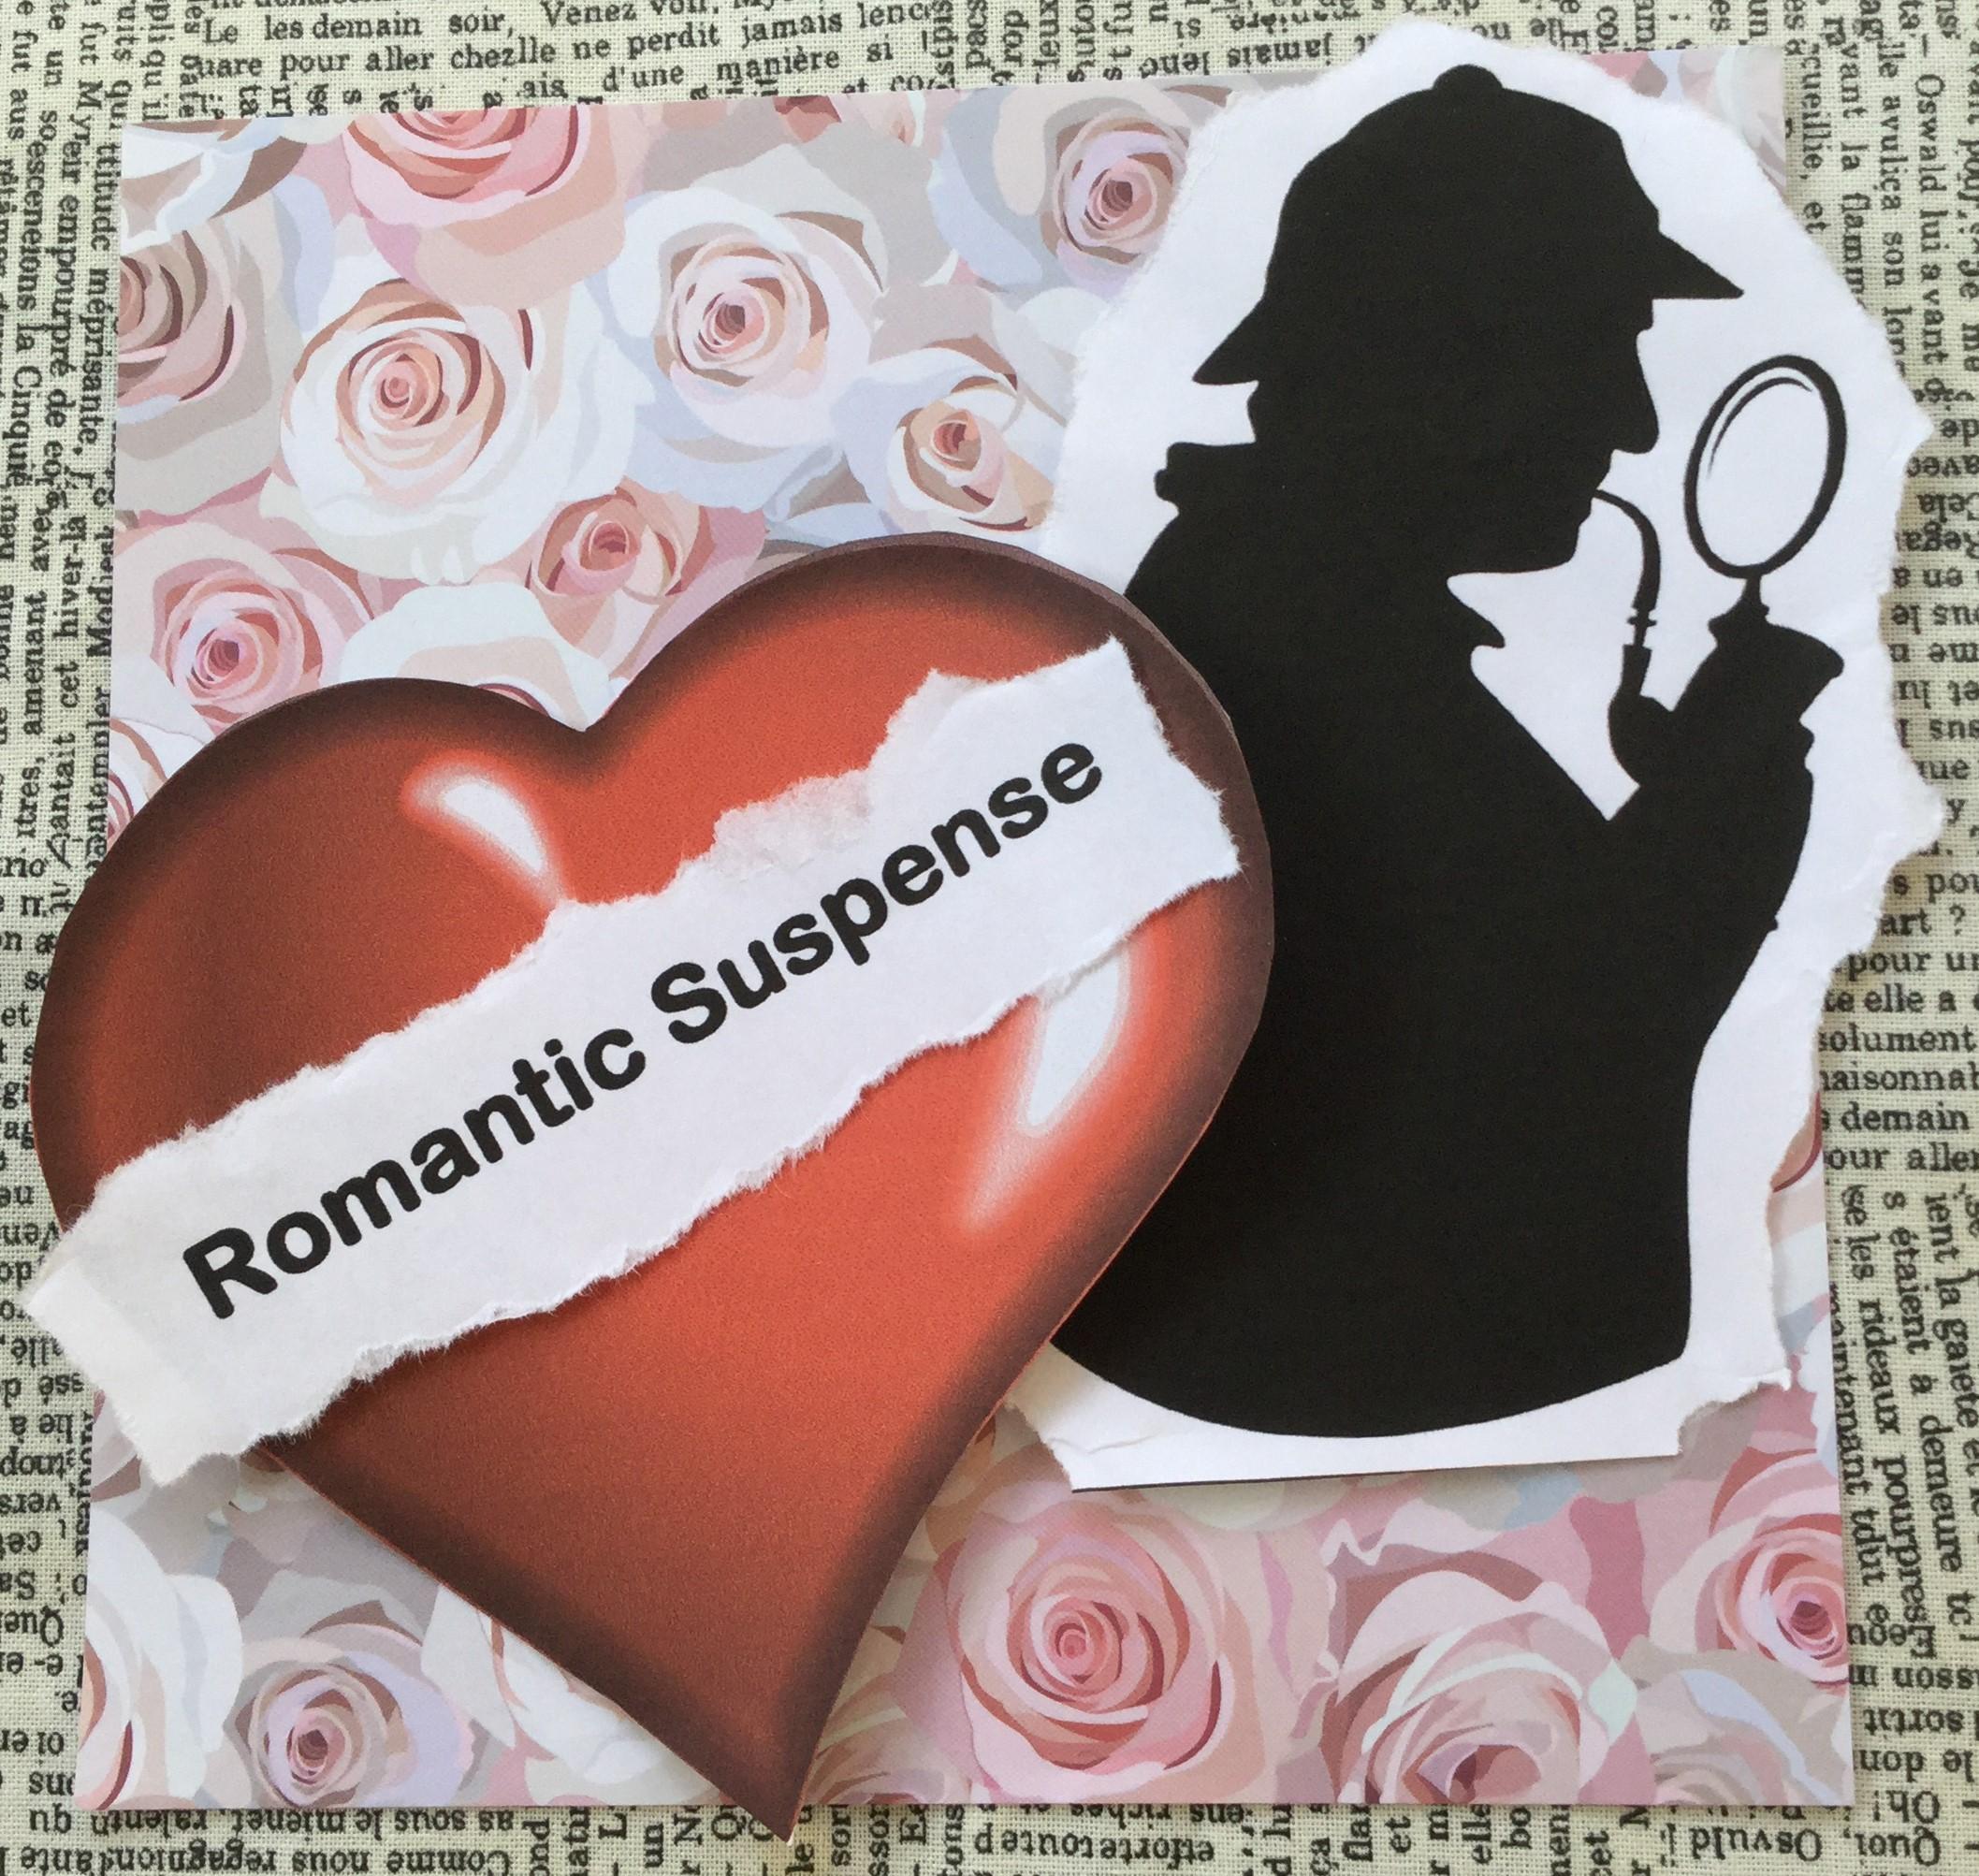 Romantic Suspense: Book Reviewer, Avid Reader And Bookworm